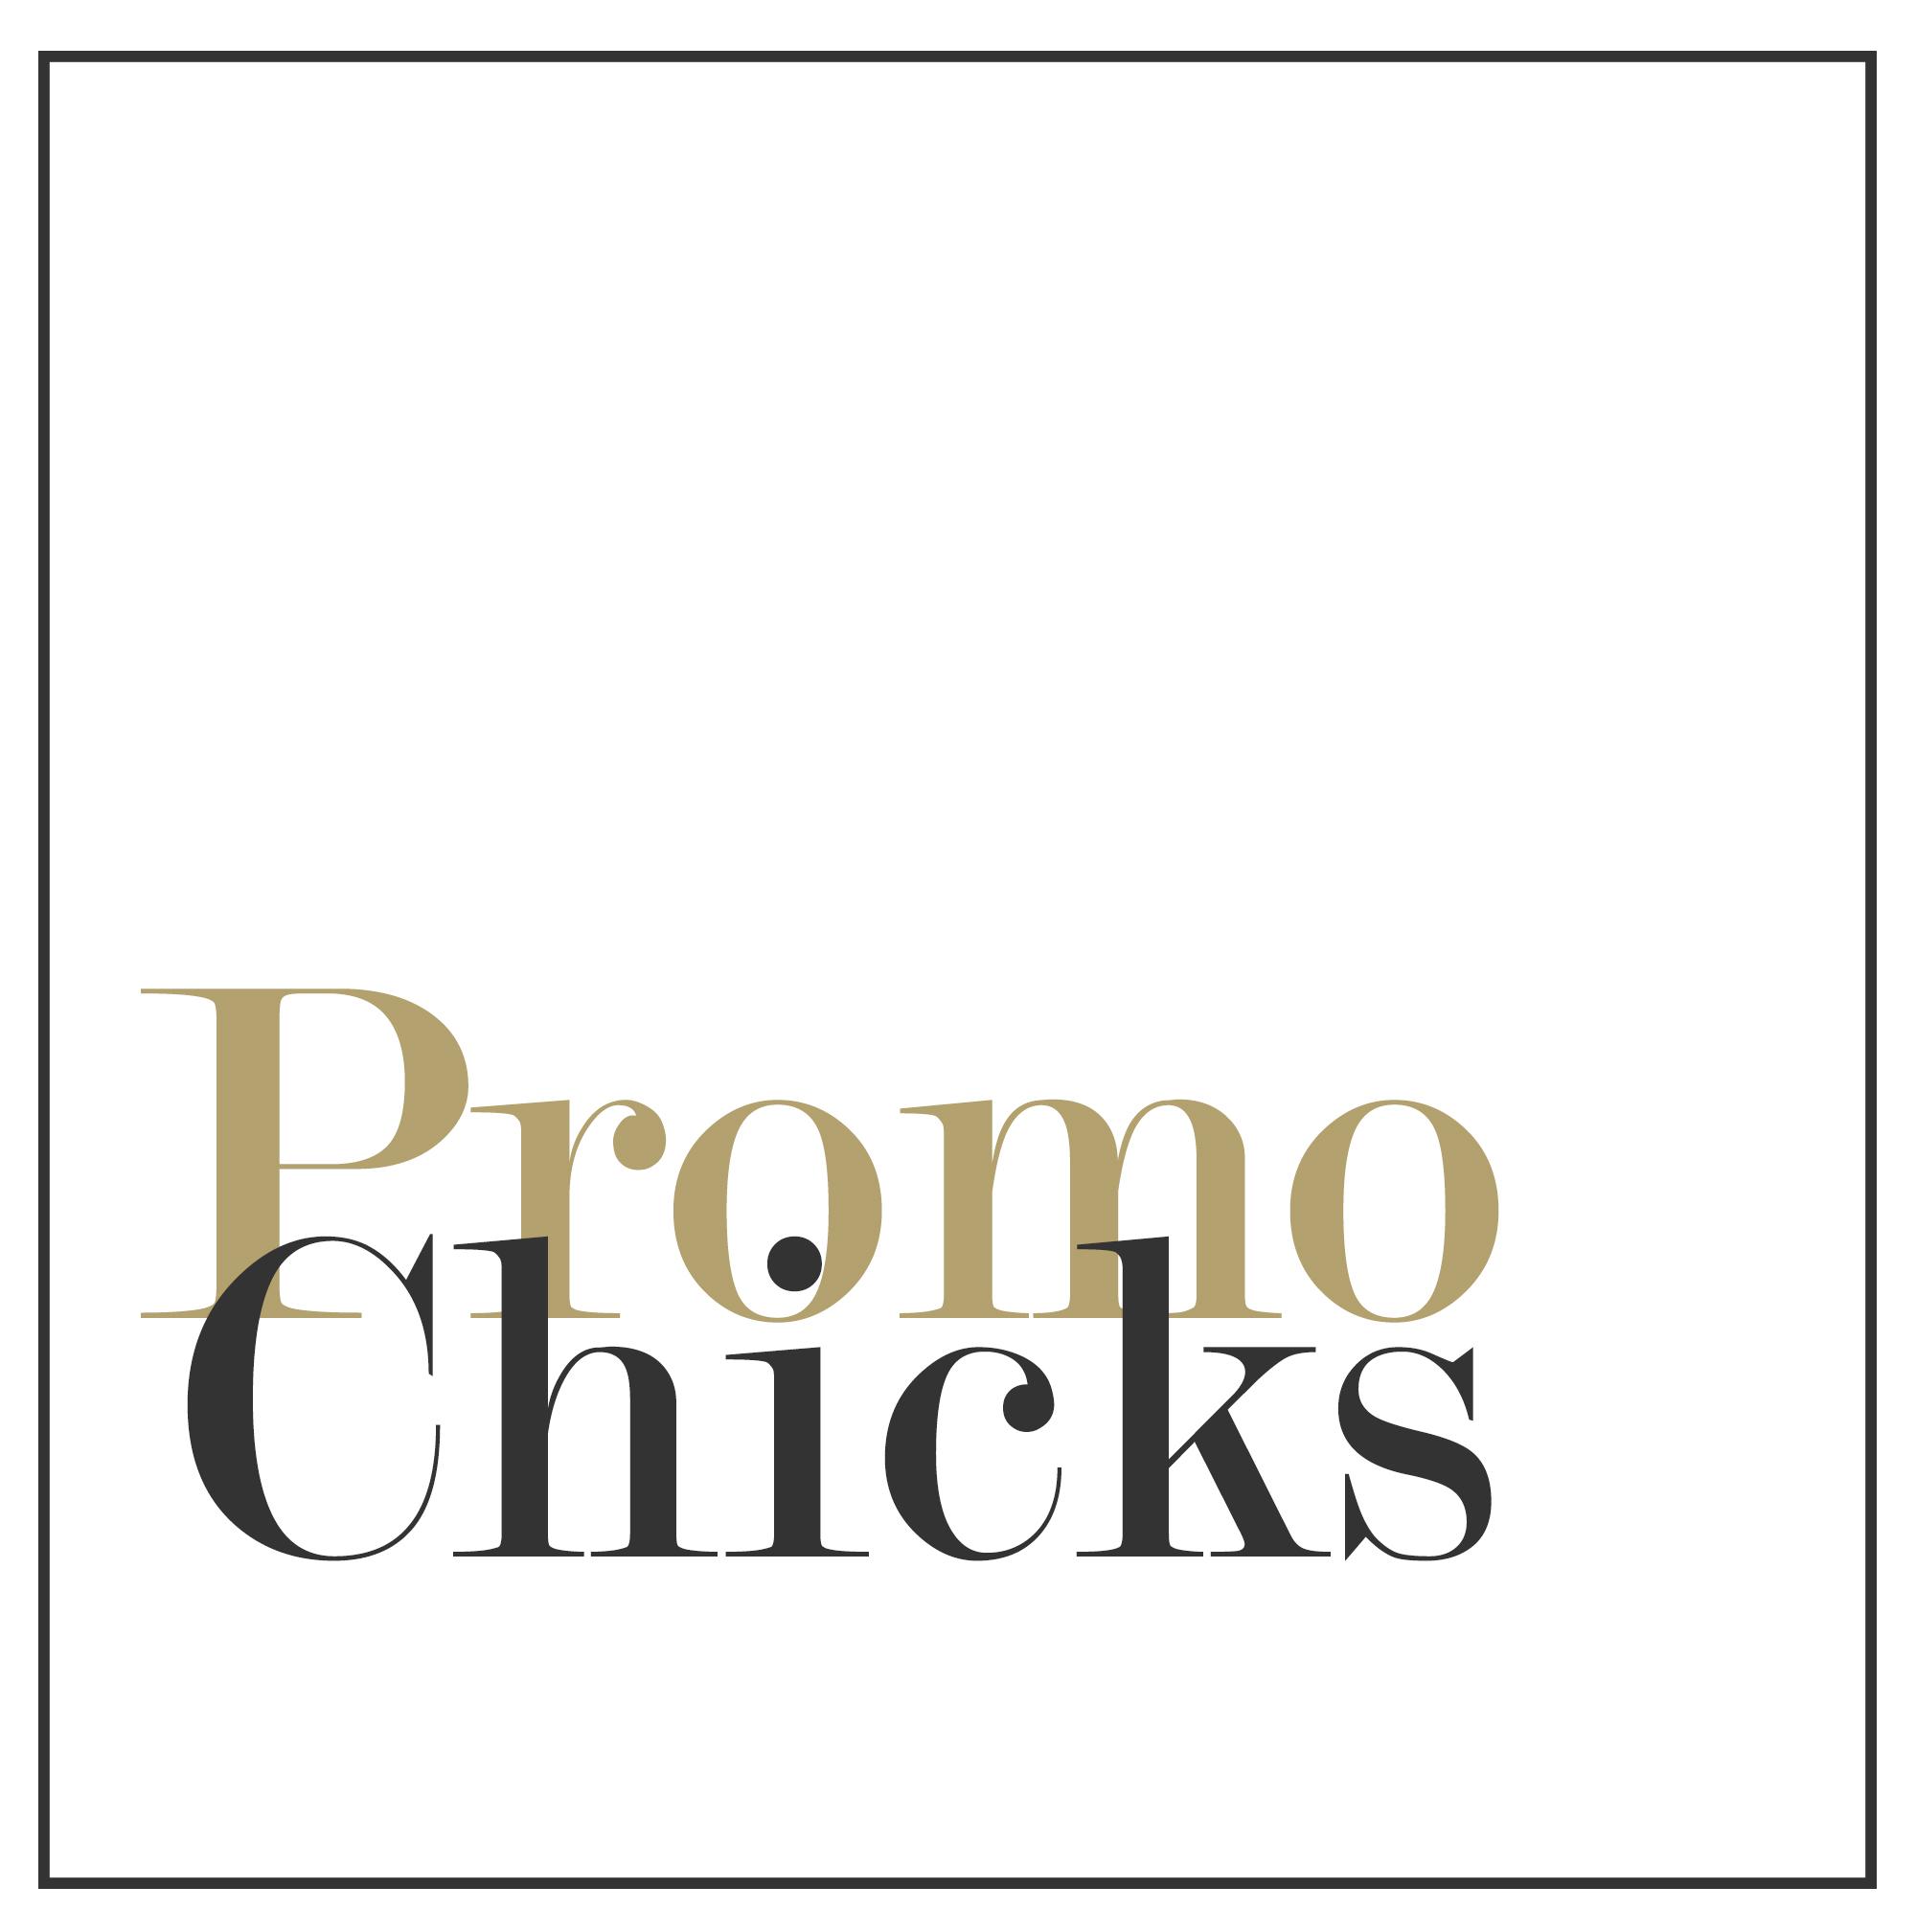 PromoChicks